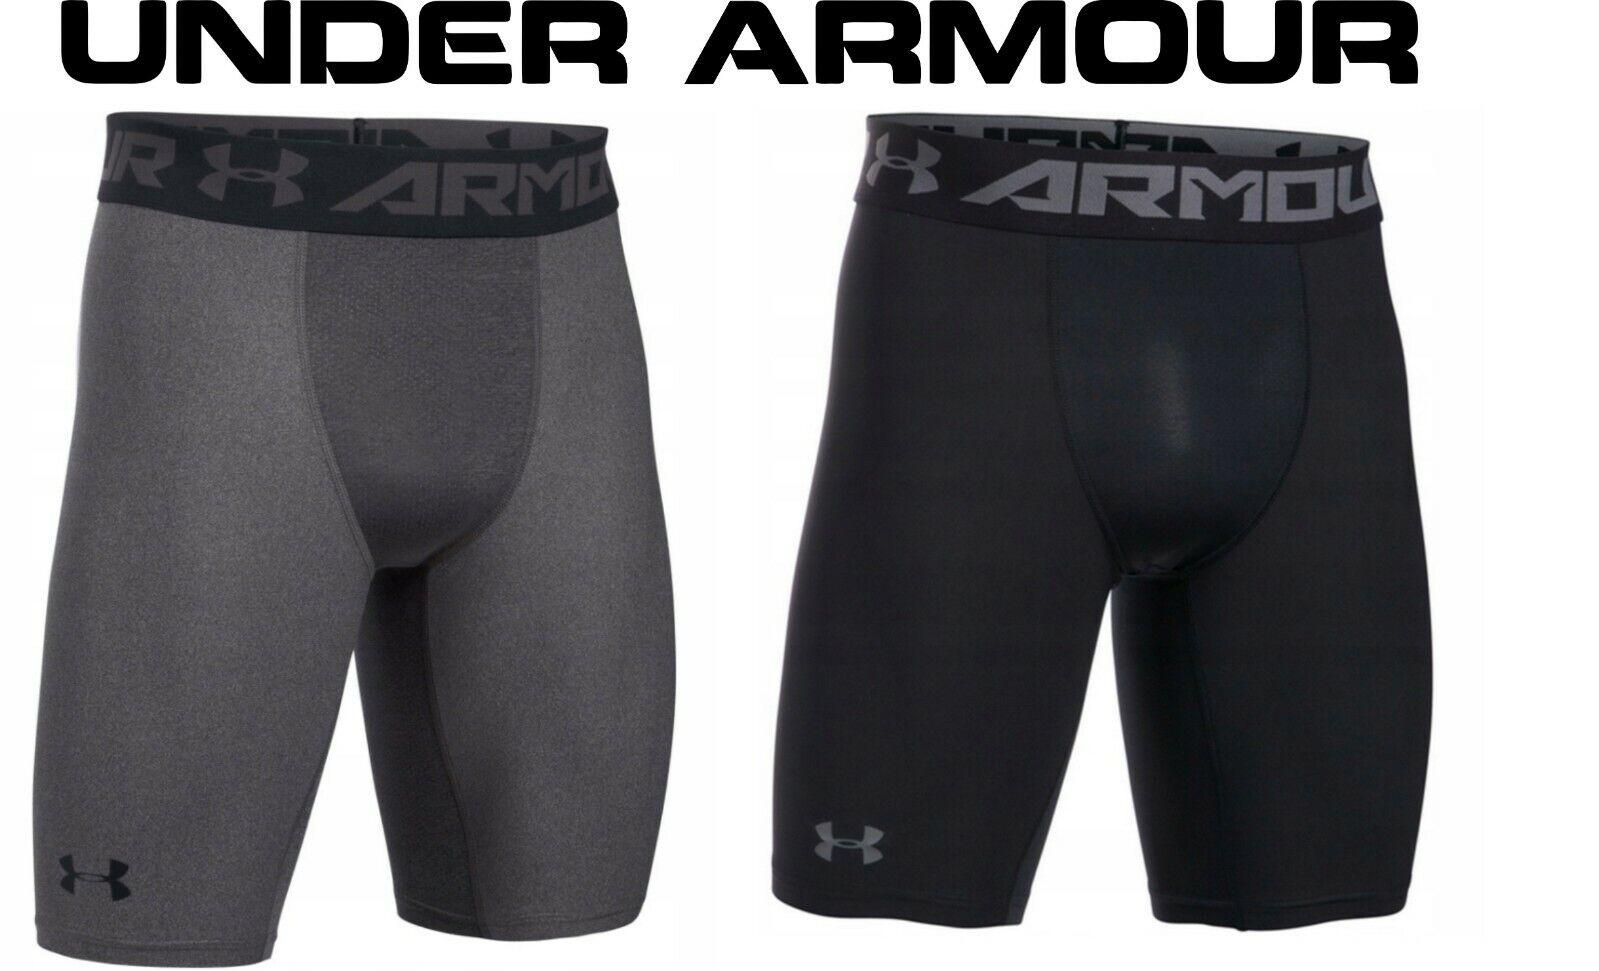 Under Armour HeatGear 2.0 Compression Long Short Hose carbon 1289568-090 Shorts